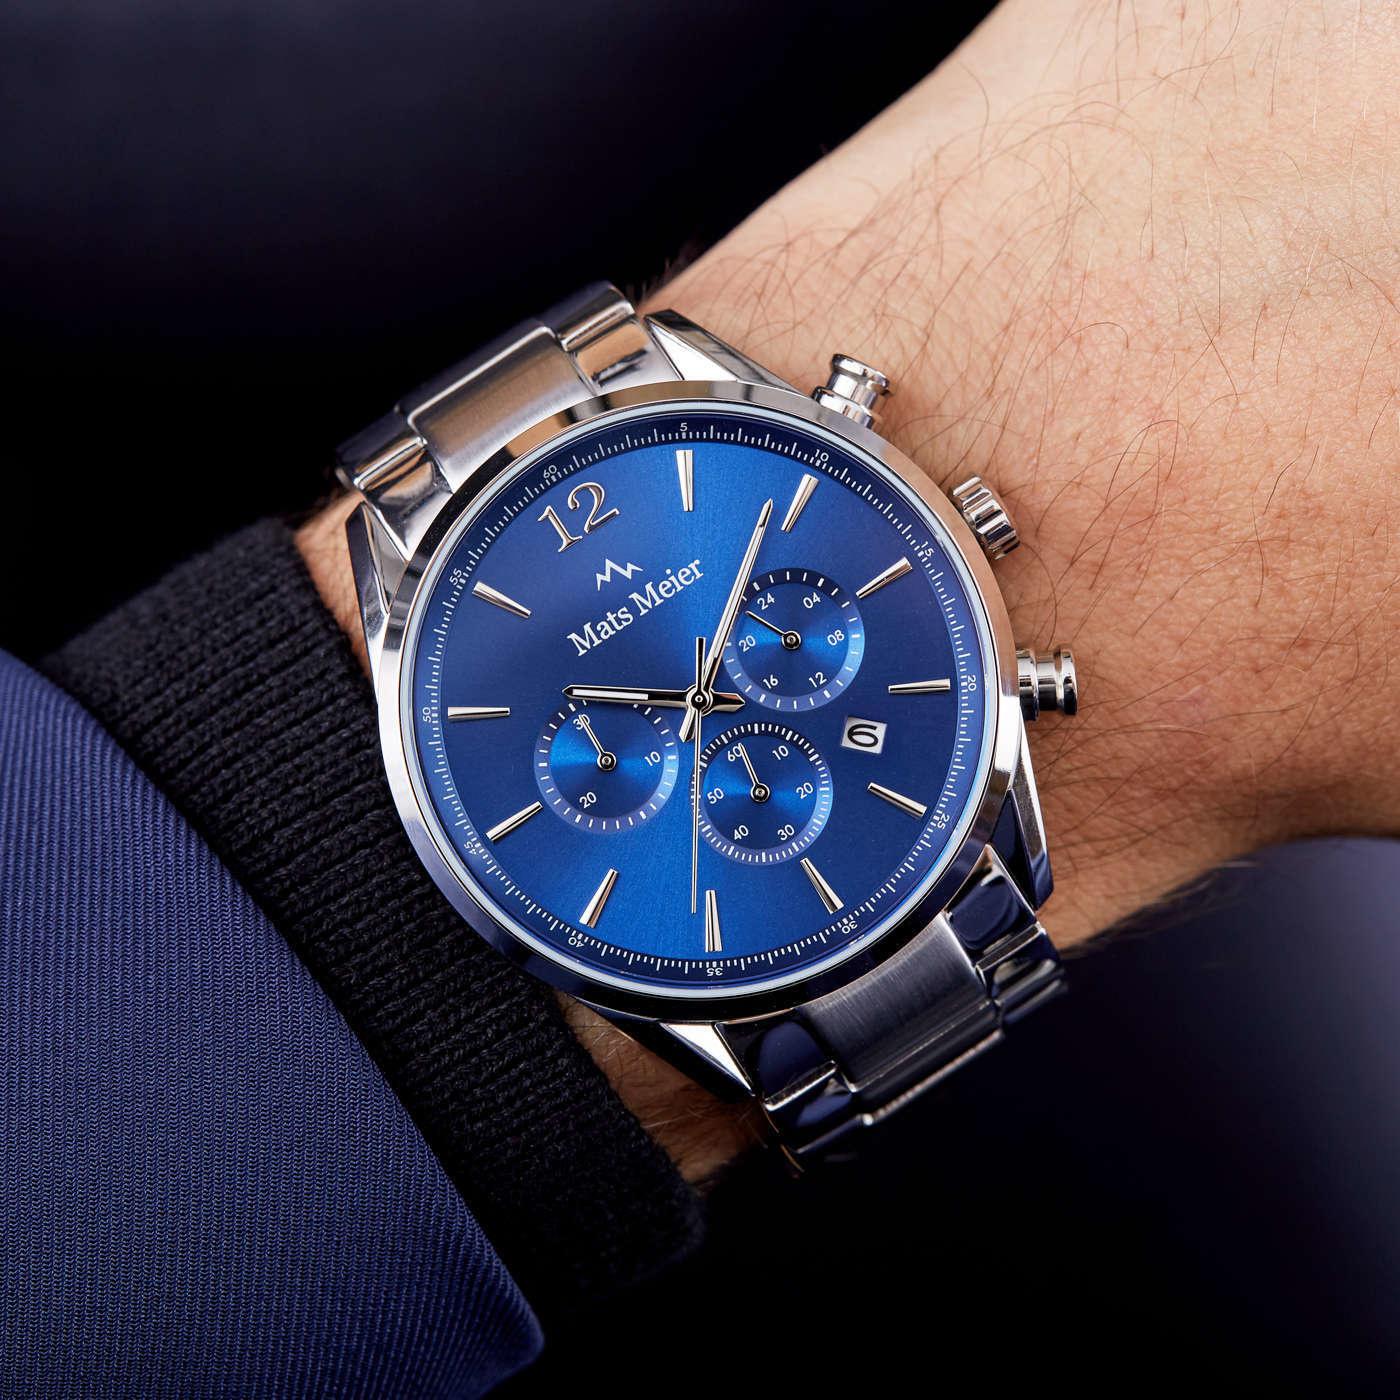 Mats Meier Grand Cornier chronograph mens watch blue / silver colored